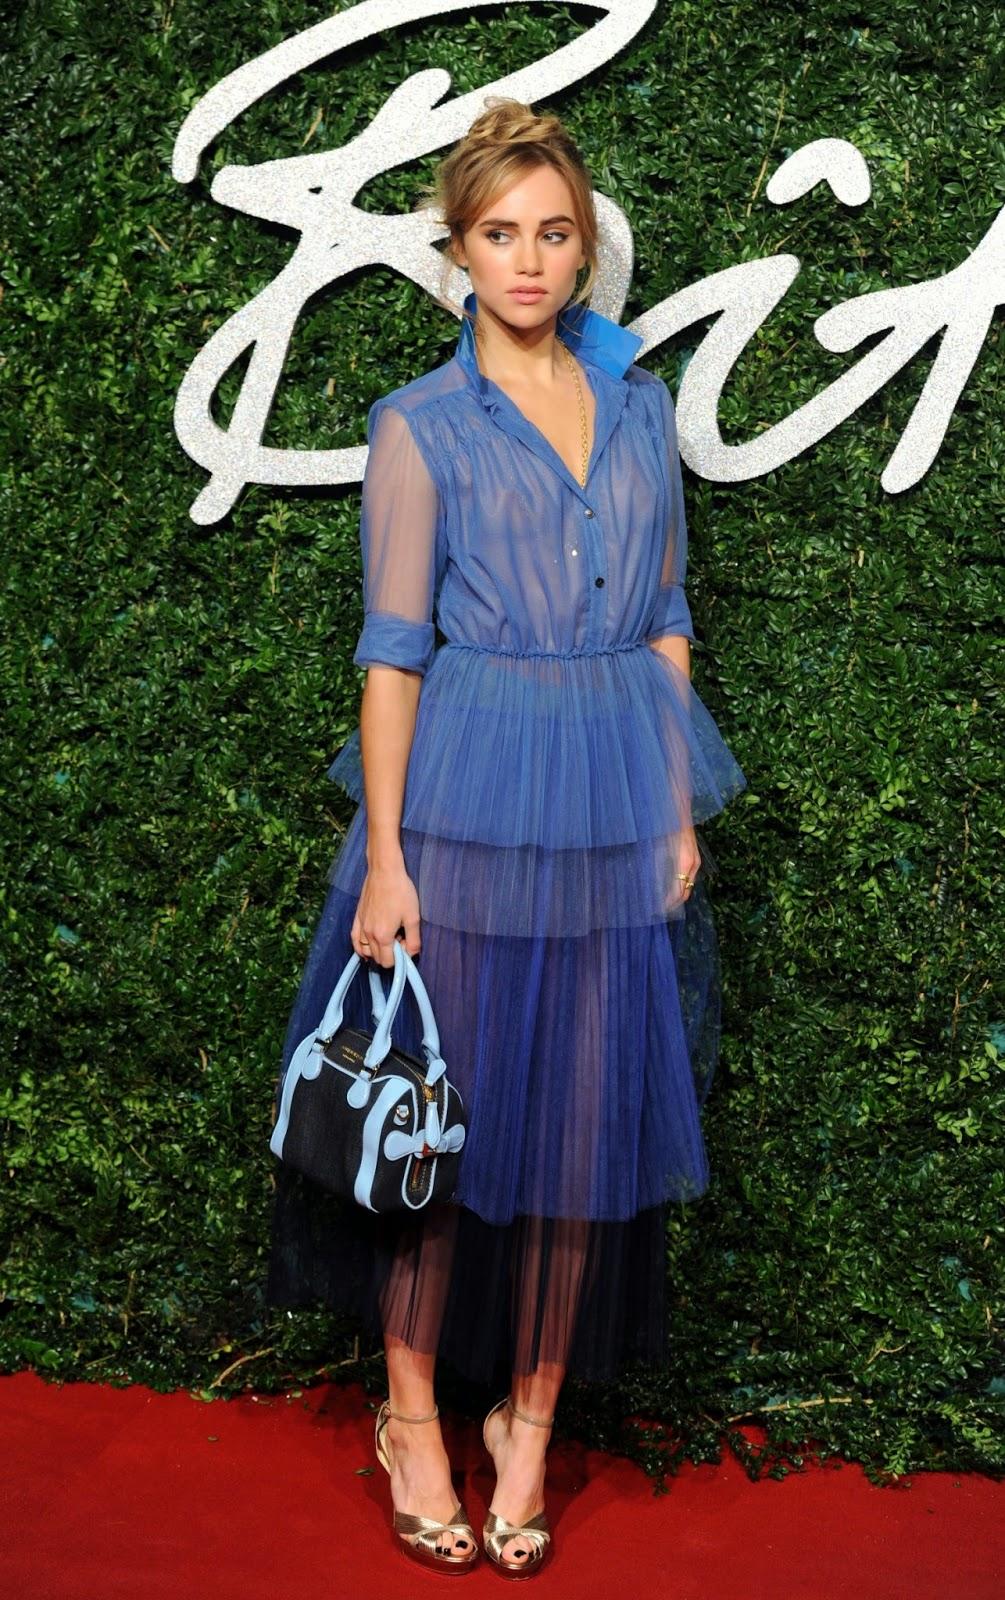 Fashion Awards 2017 In London: The Celebrity Braless Trendy : Suki Waterhouse Braless On